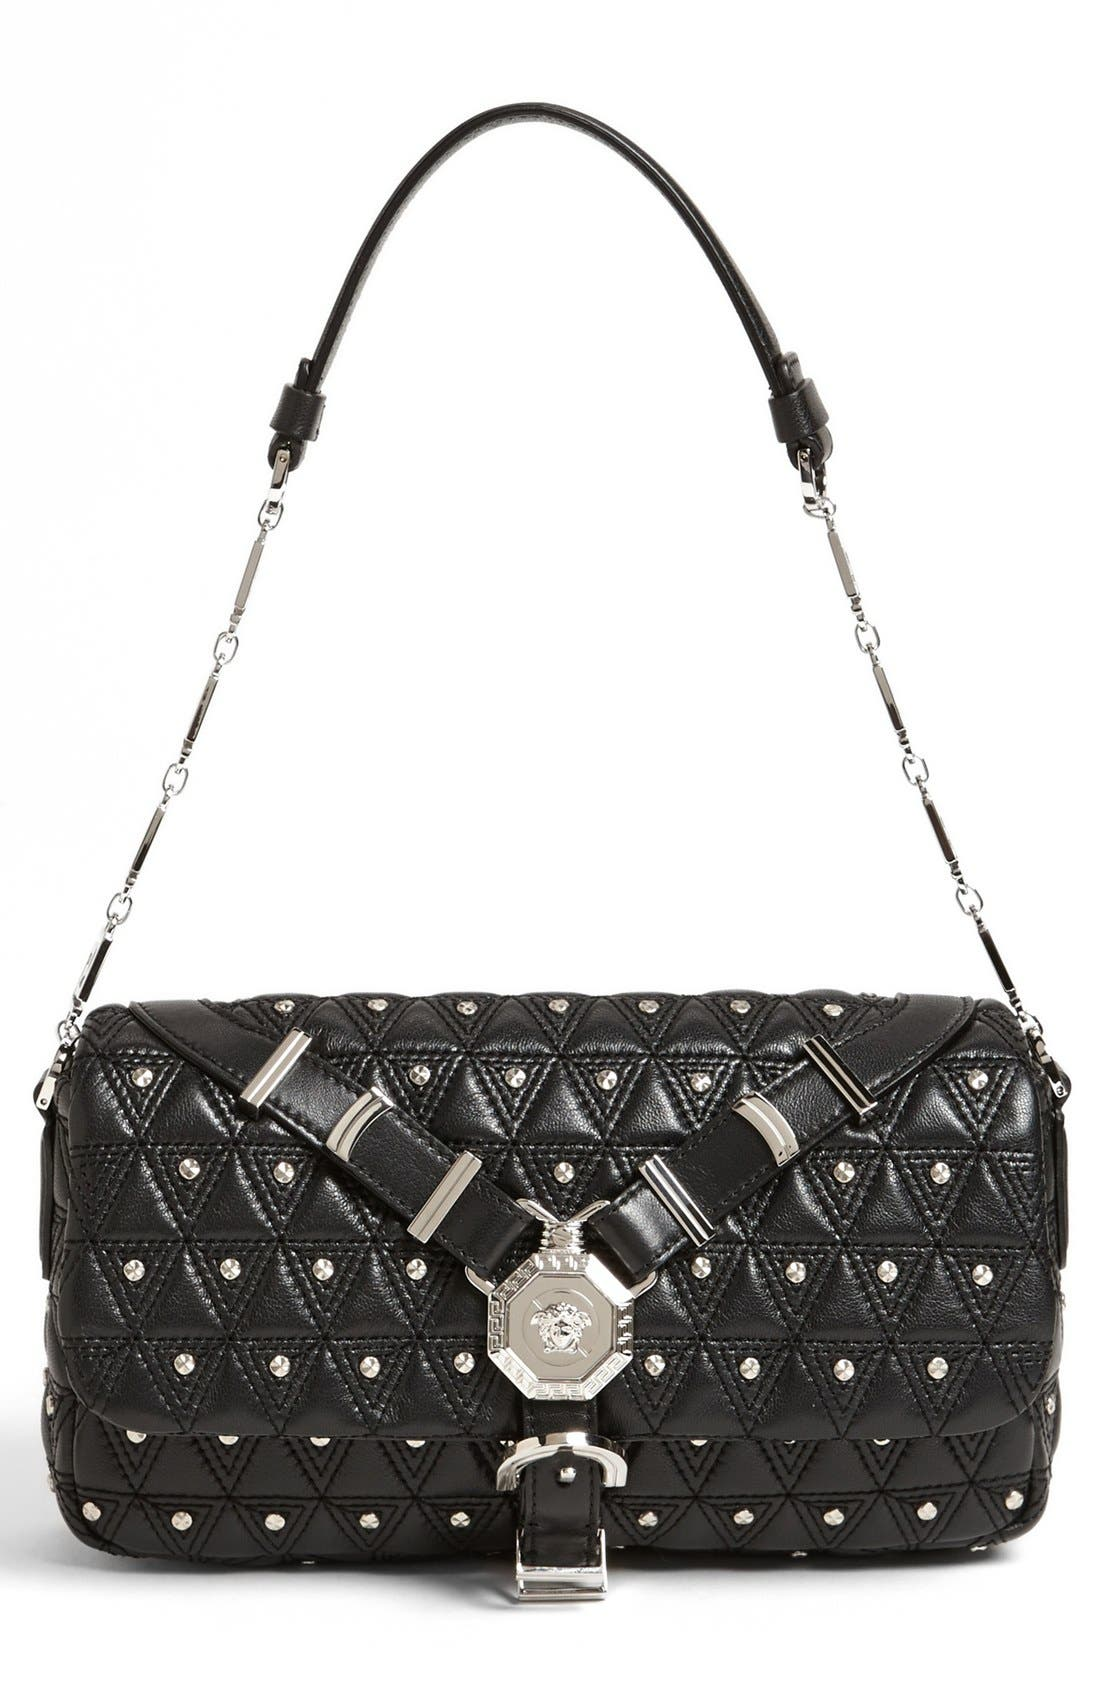 Main Image - Versace 'Vanitas' Leather Flap Shoulder Bag